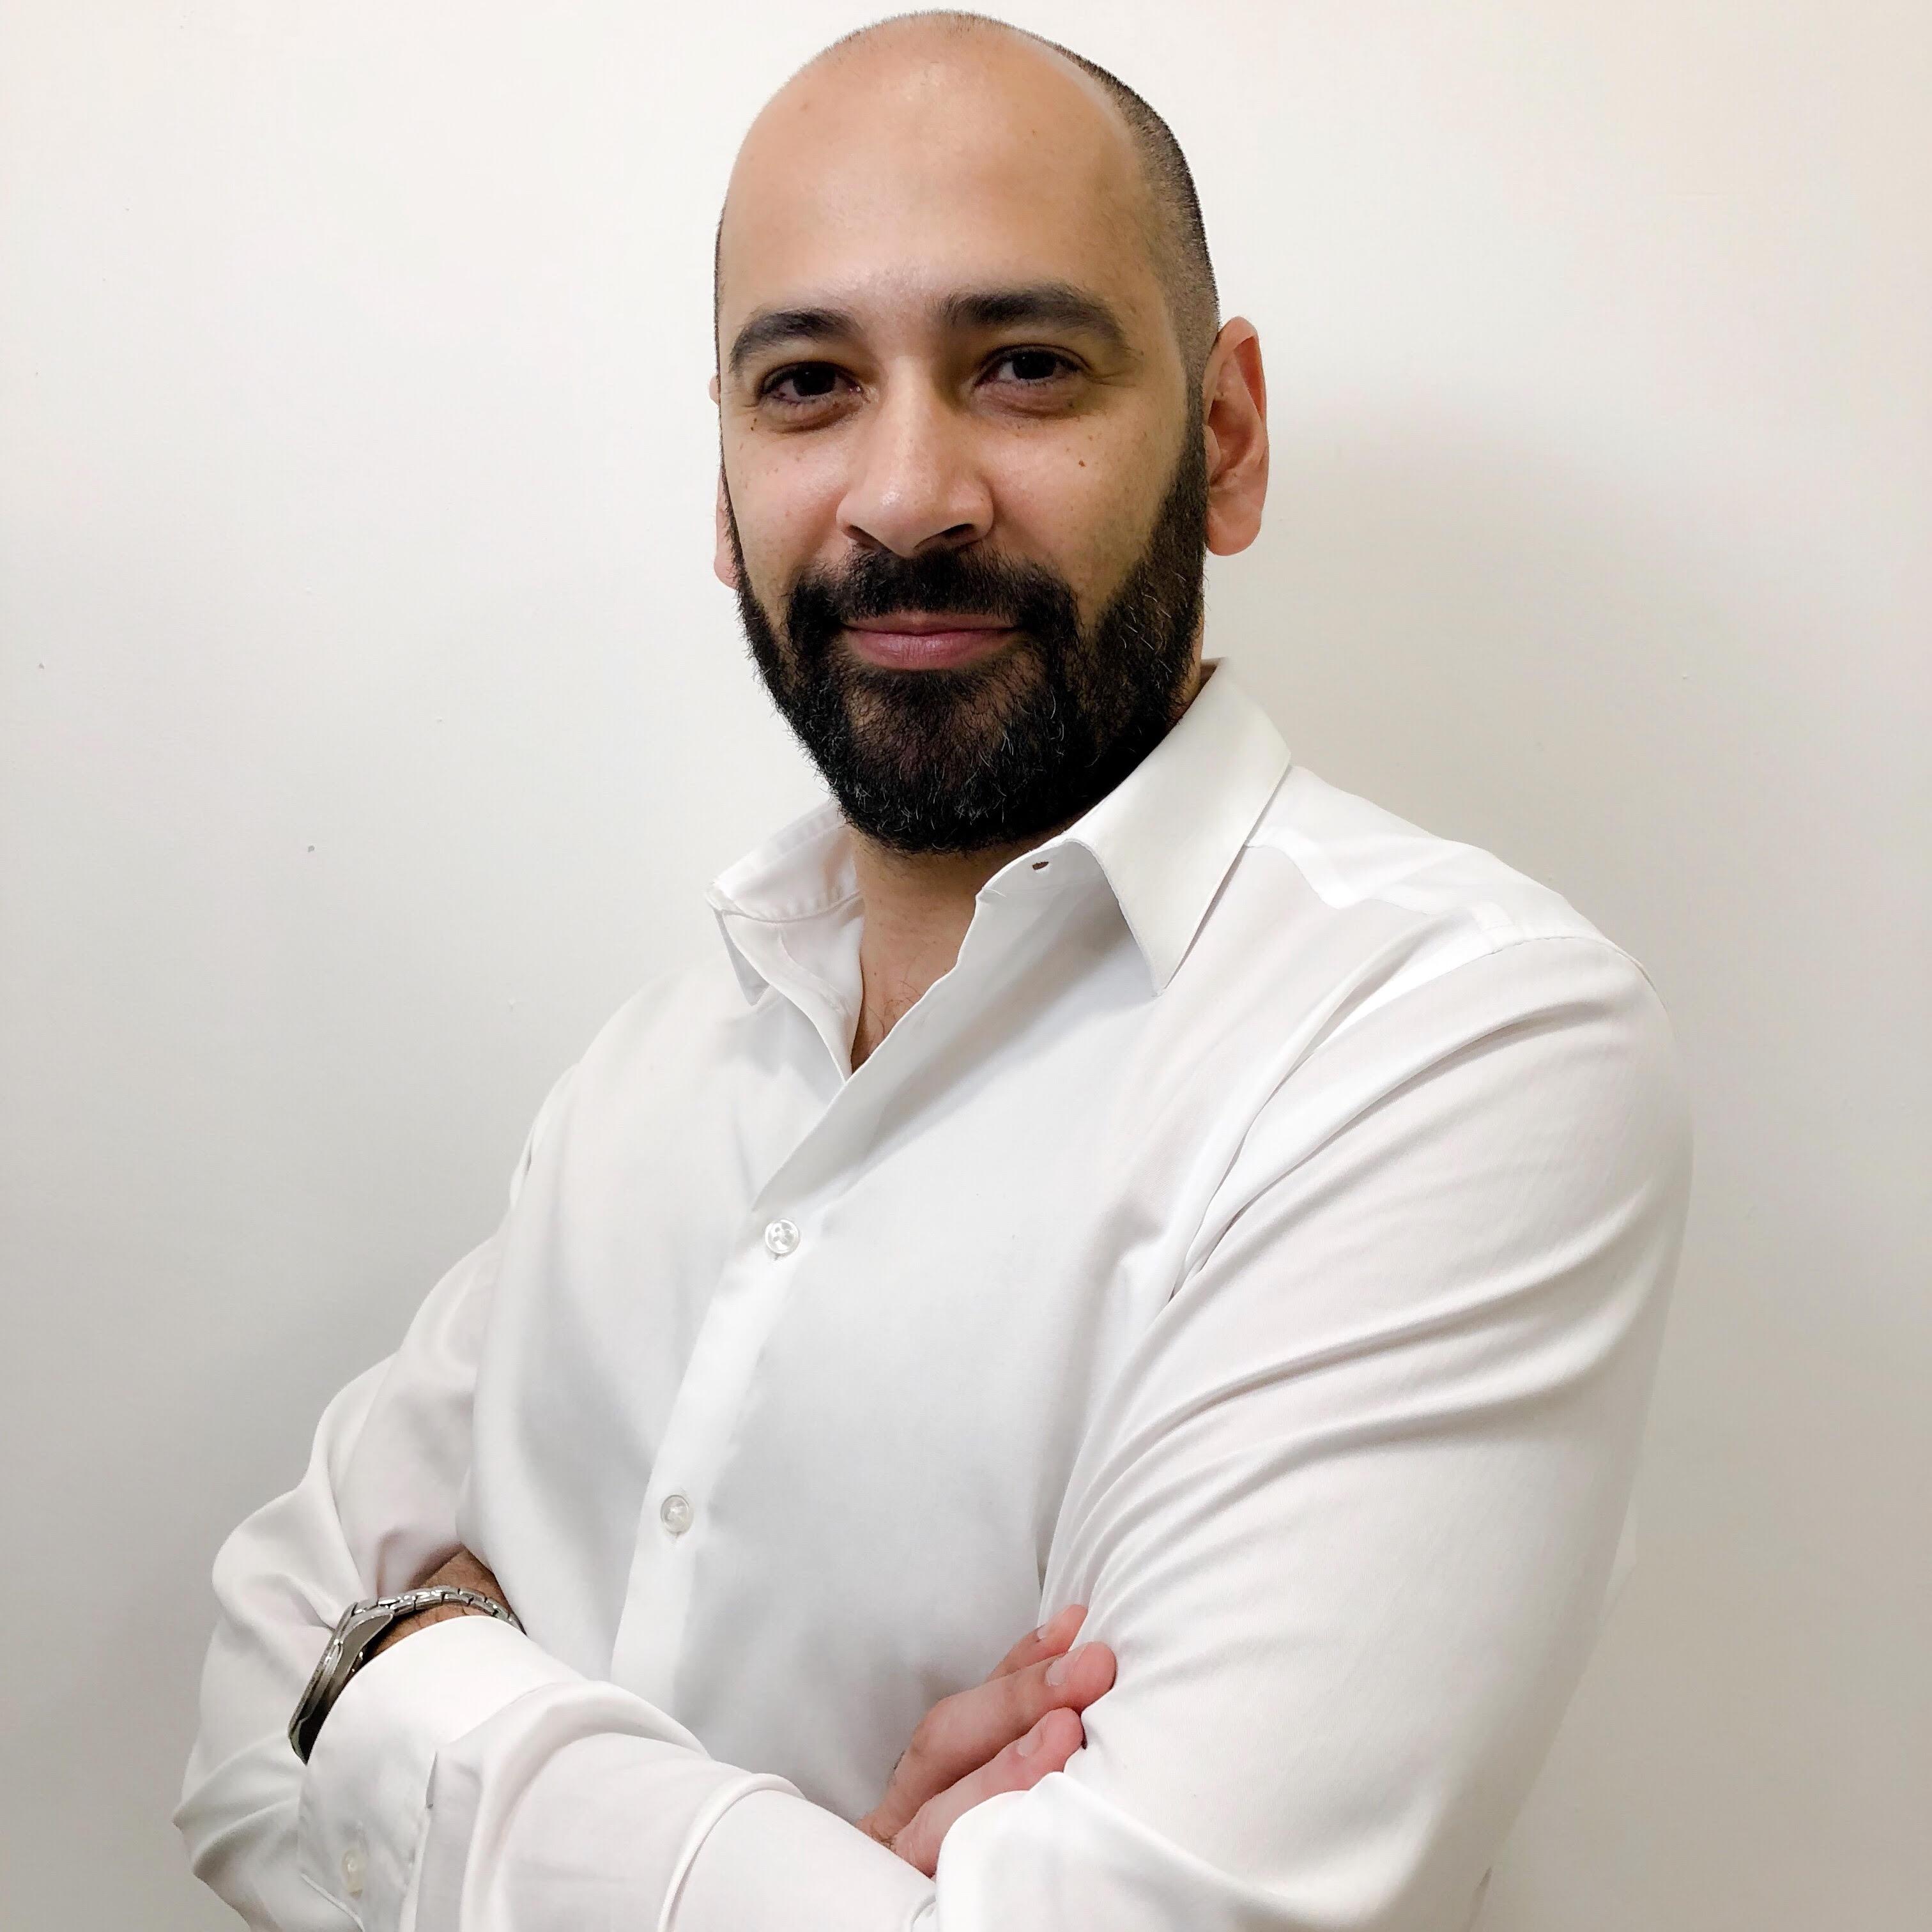 Diego Cardoza, General Manager, Codisa